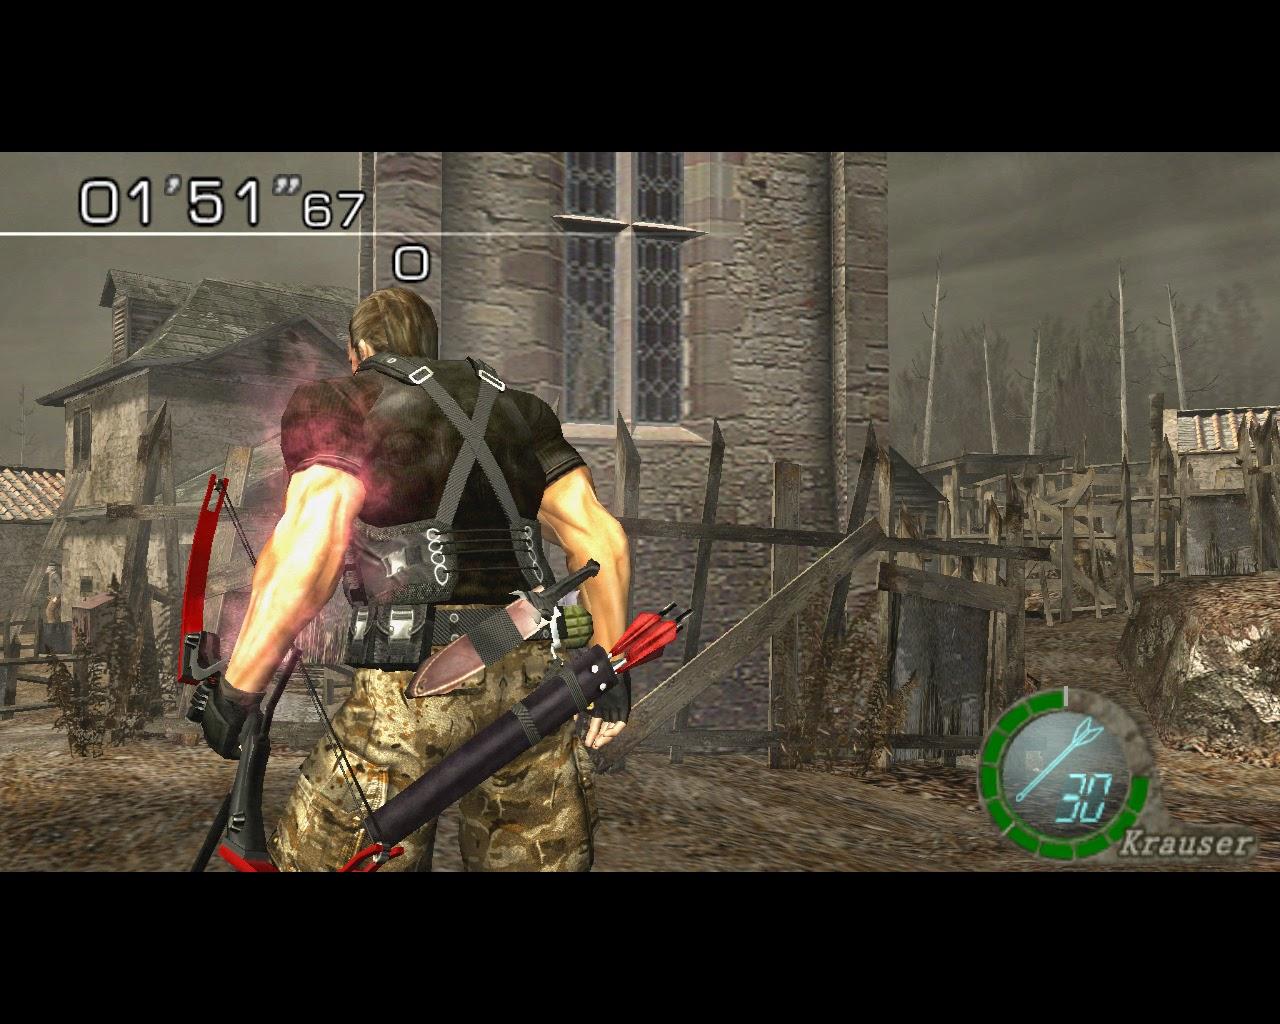 [OFFLINE] Krauser Mega HD Game%2B2015-03-08%2B17-15-58-921